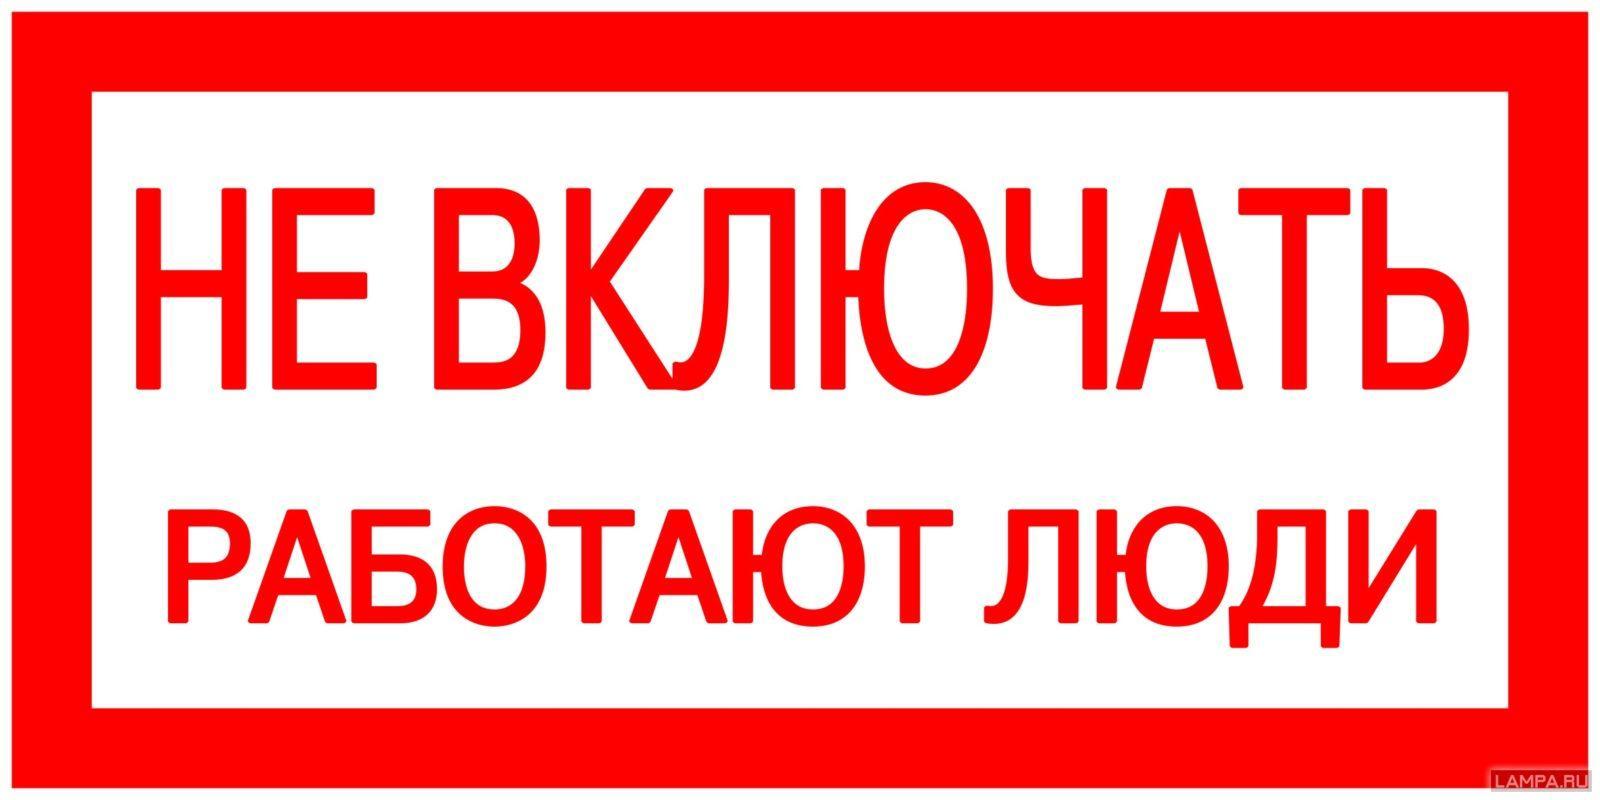 Техника безопасности при электромонтажных работах